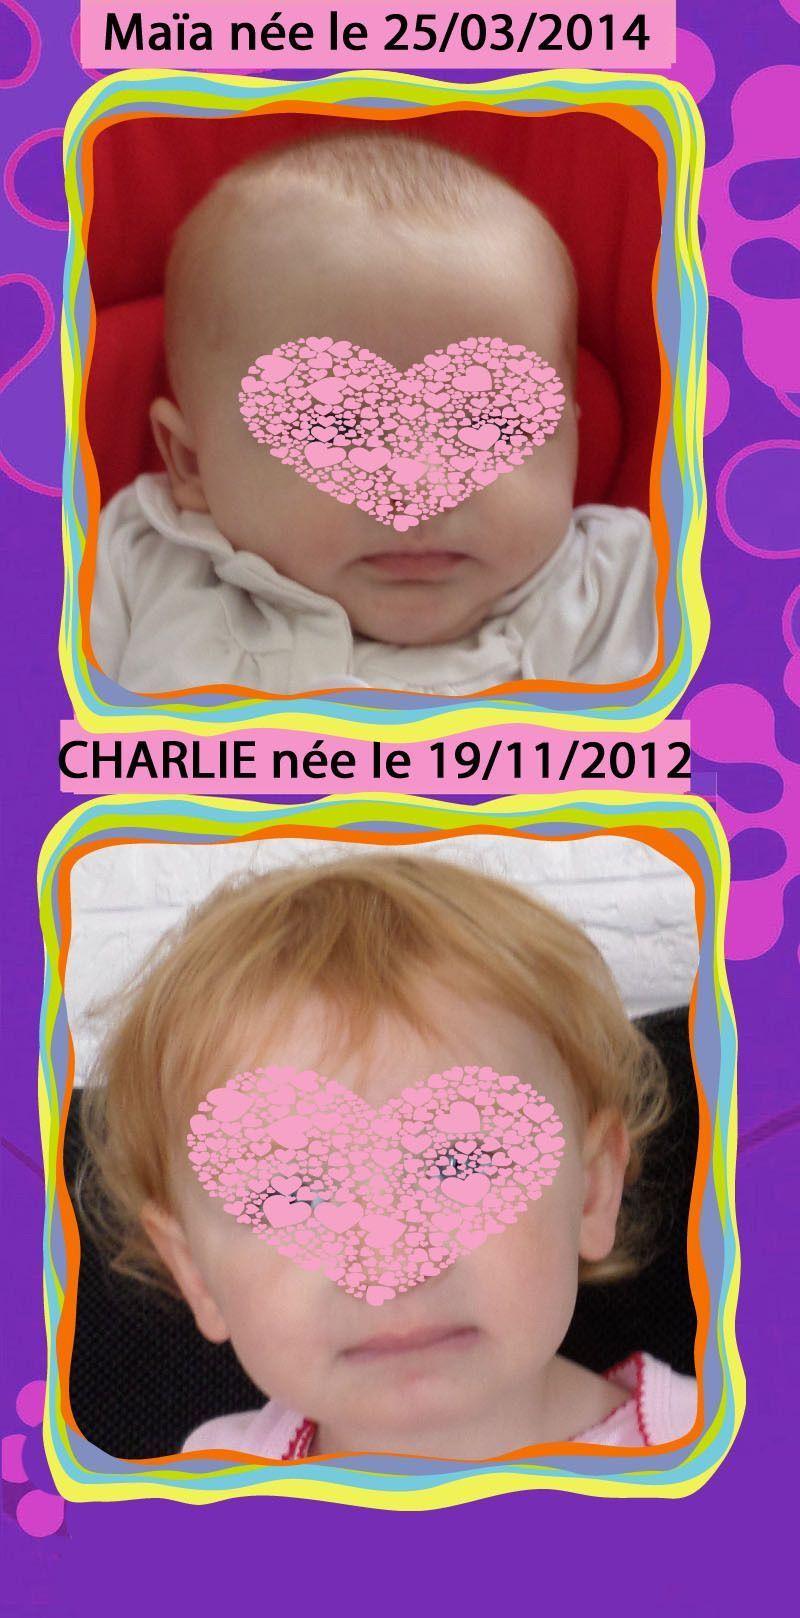 maia-et-charlie.jpg